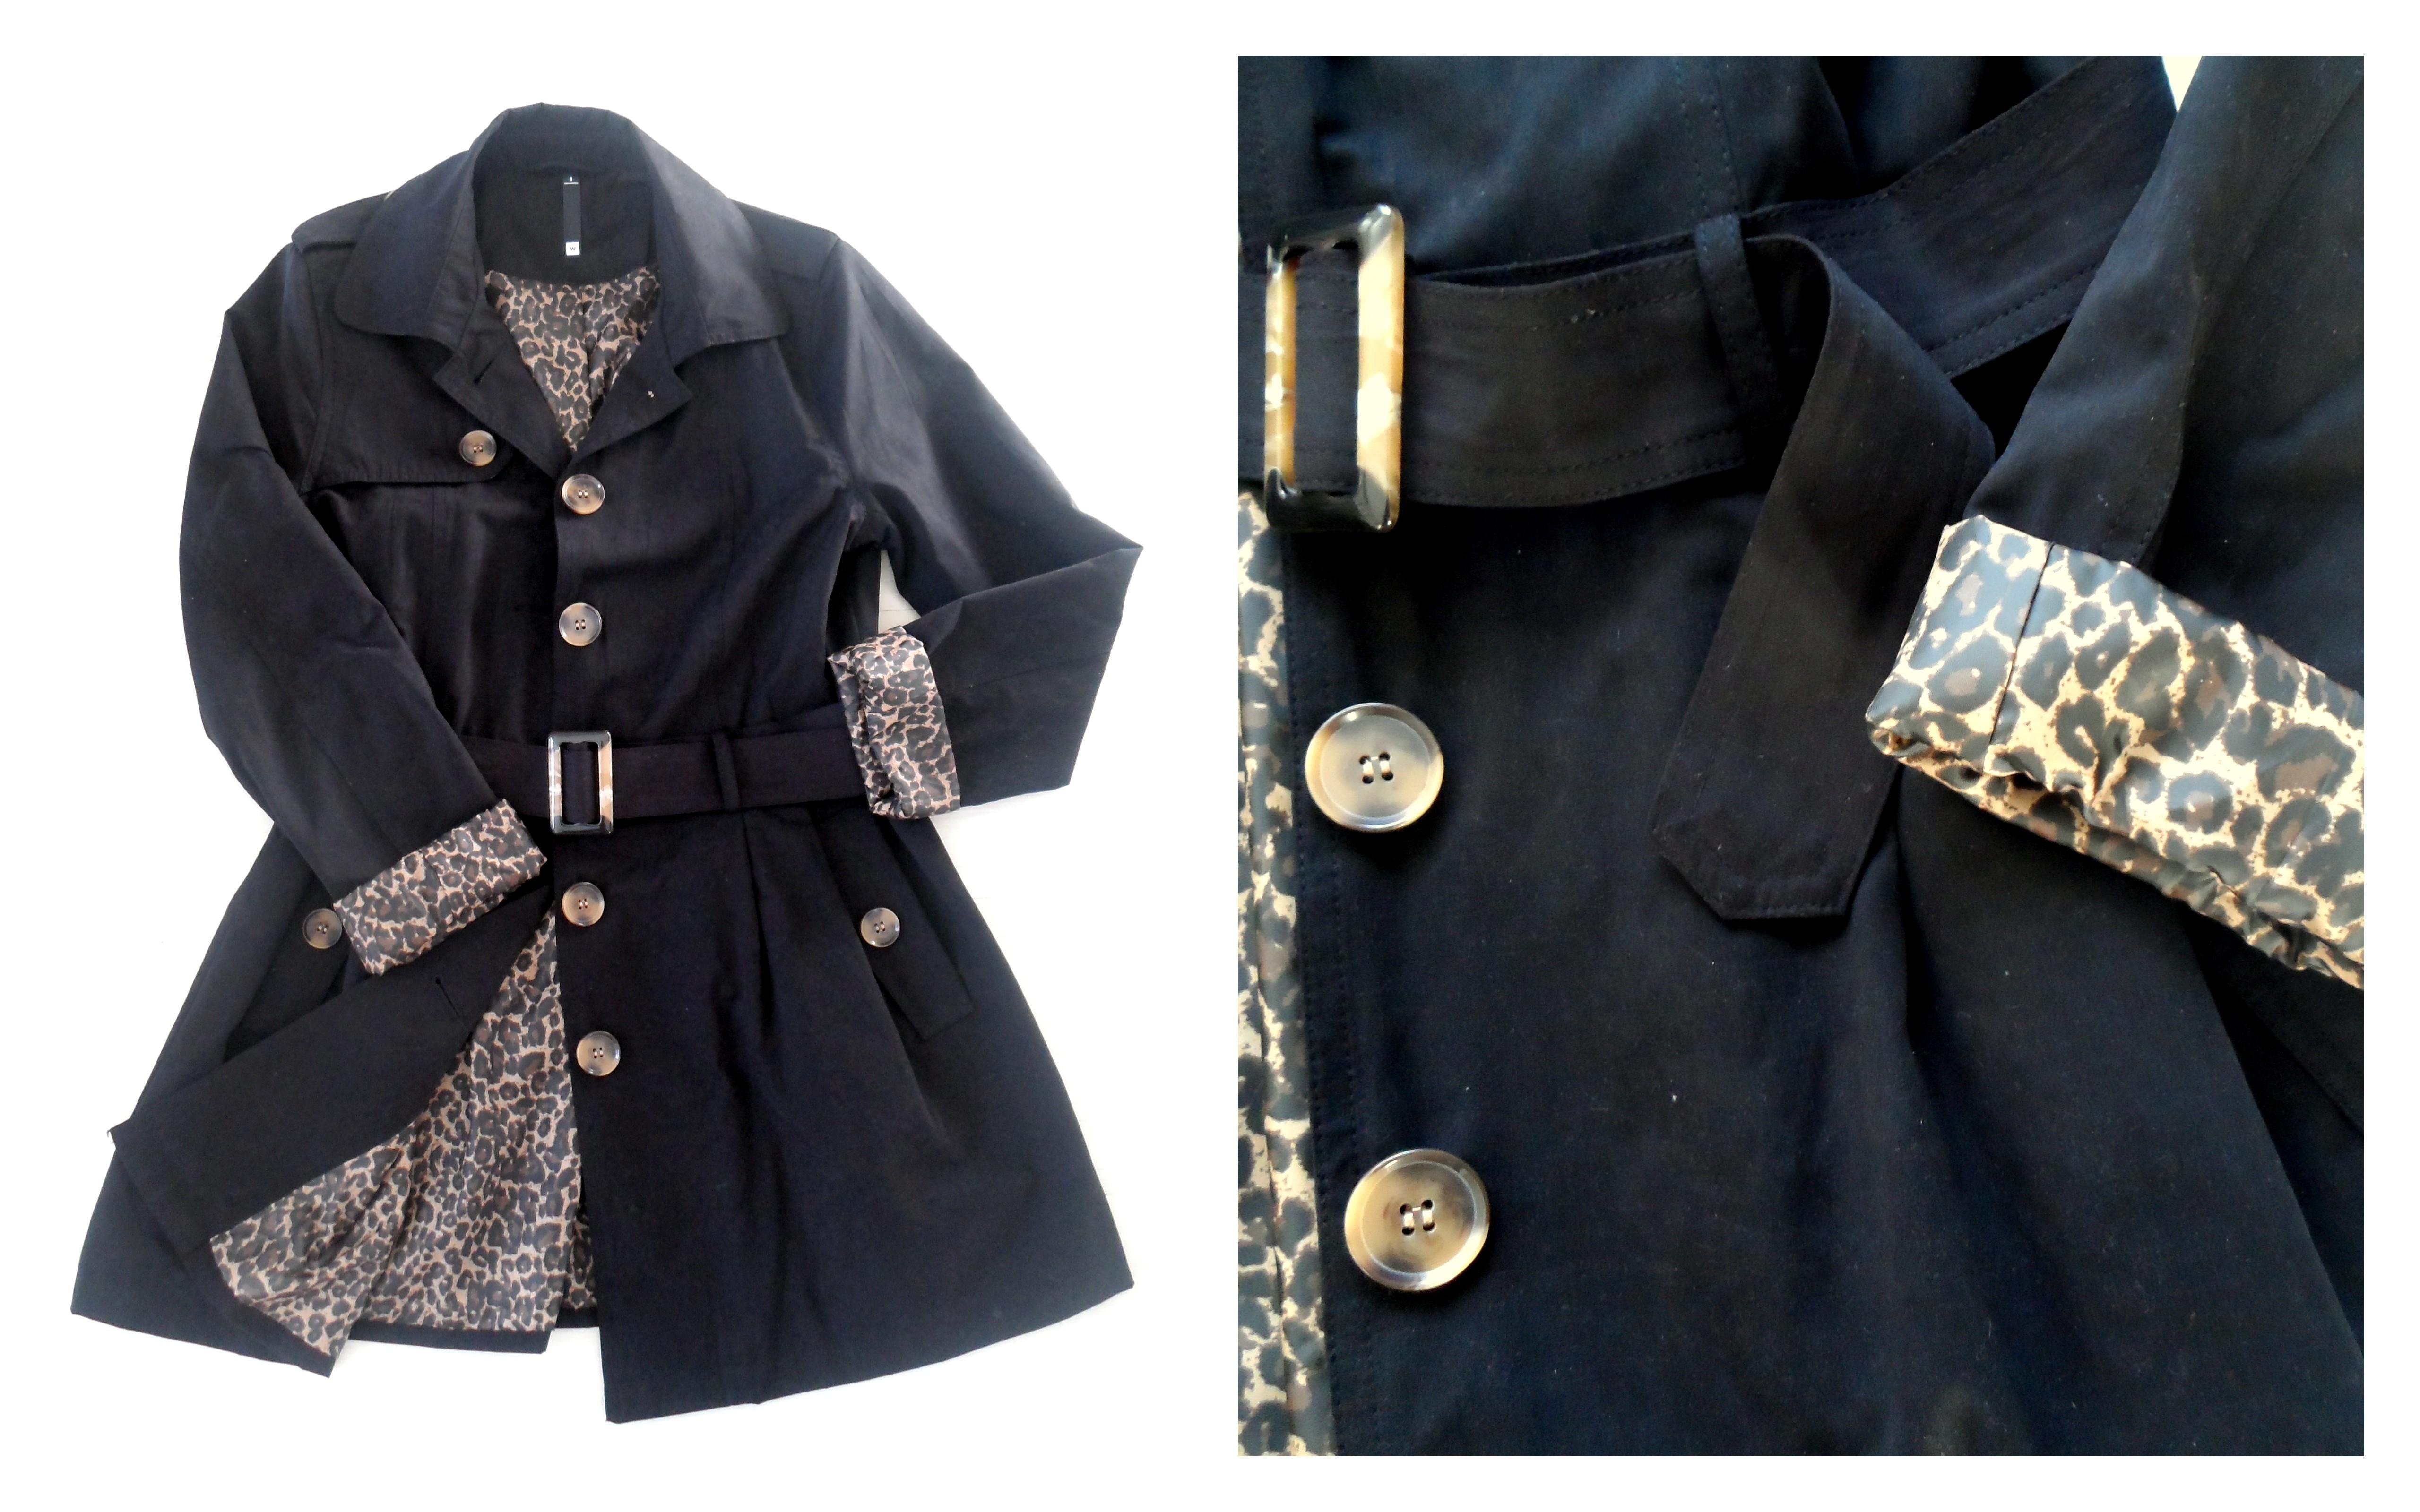 2422440e3 Zexy Cruella Deville-inspired winter fashion at Woolworths ...